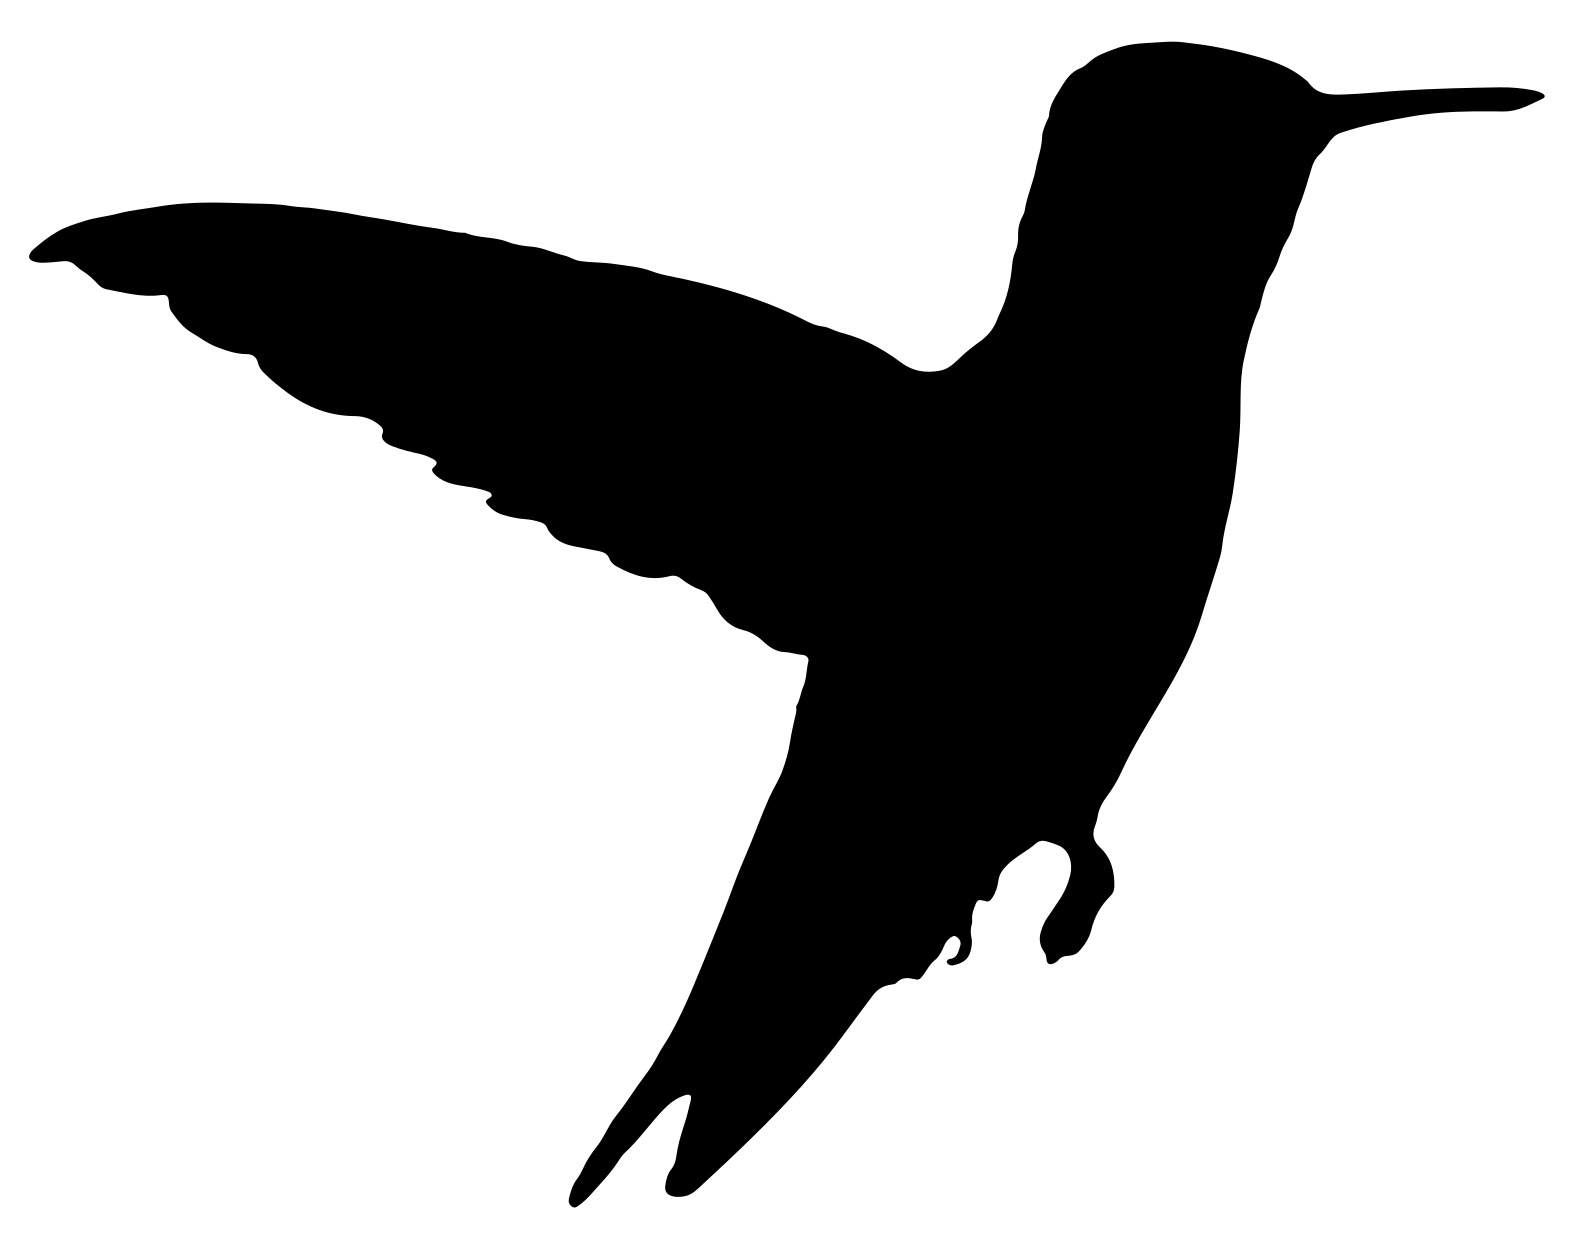 Naklejka na ścianę koliber 3